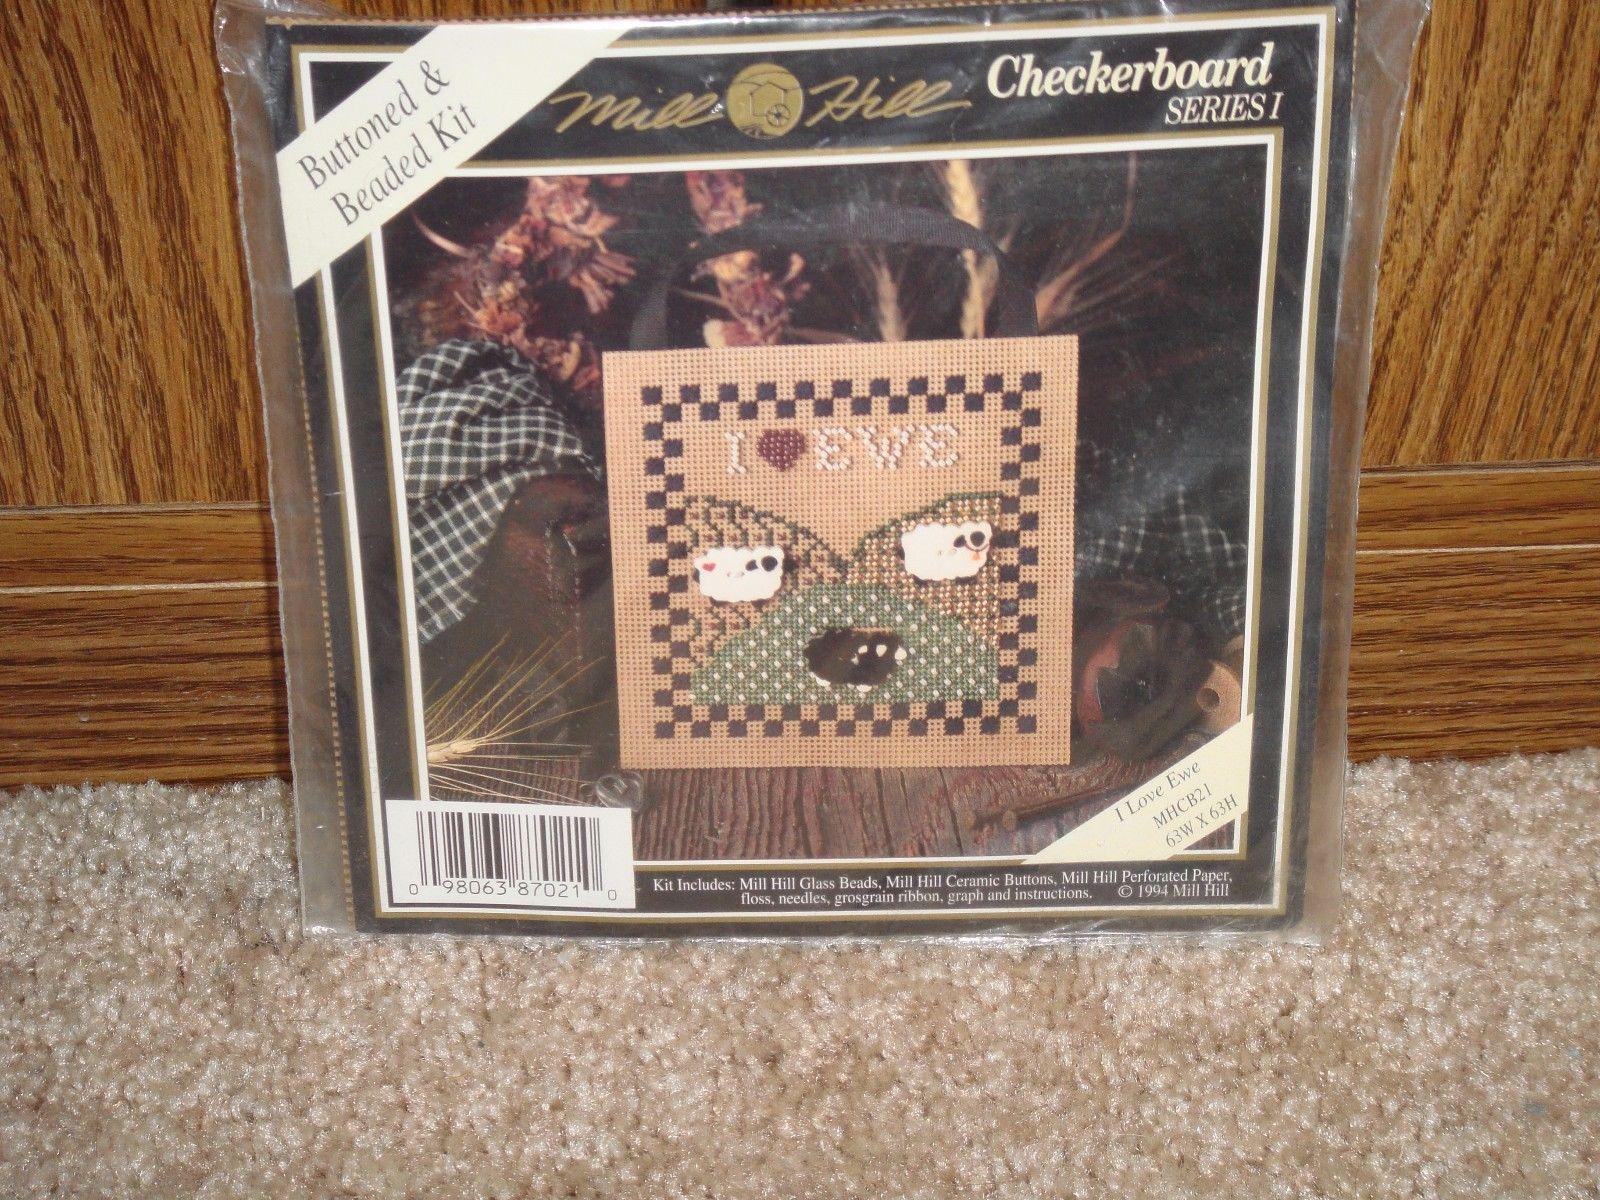 Mill Hill I Love Ewe Checkerboard Series I Cross Stitch Kit image 4